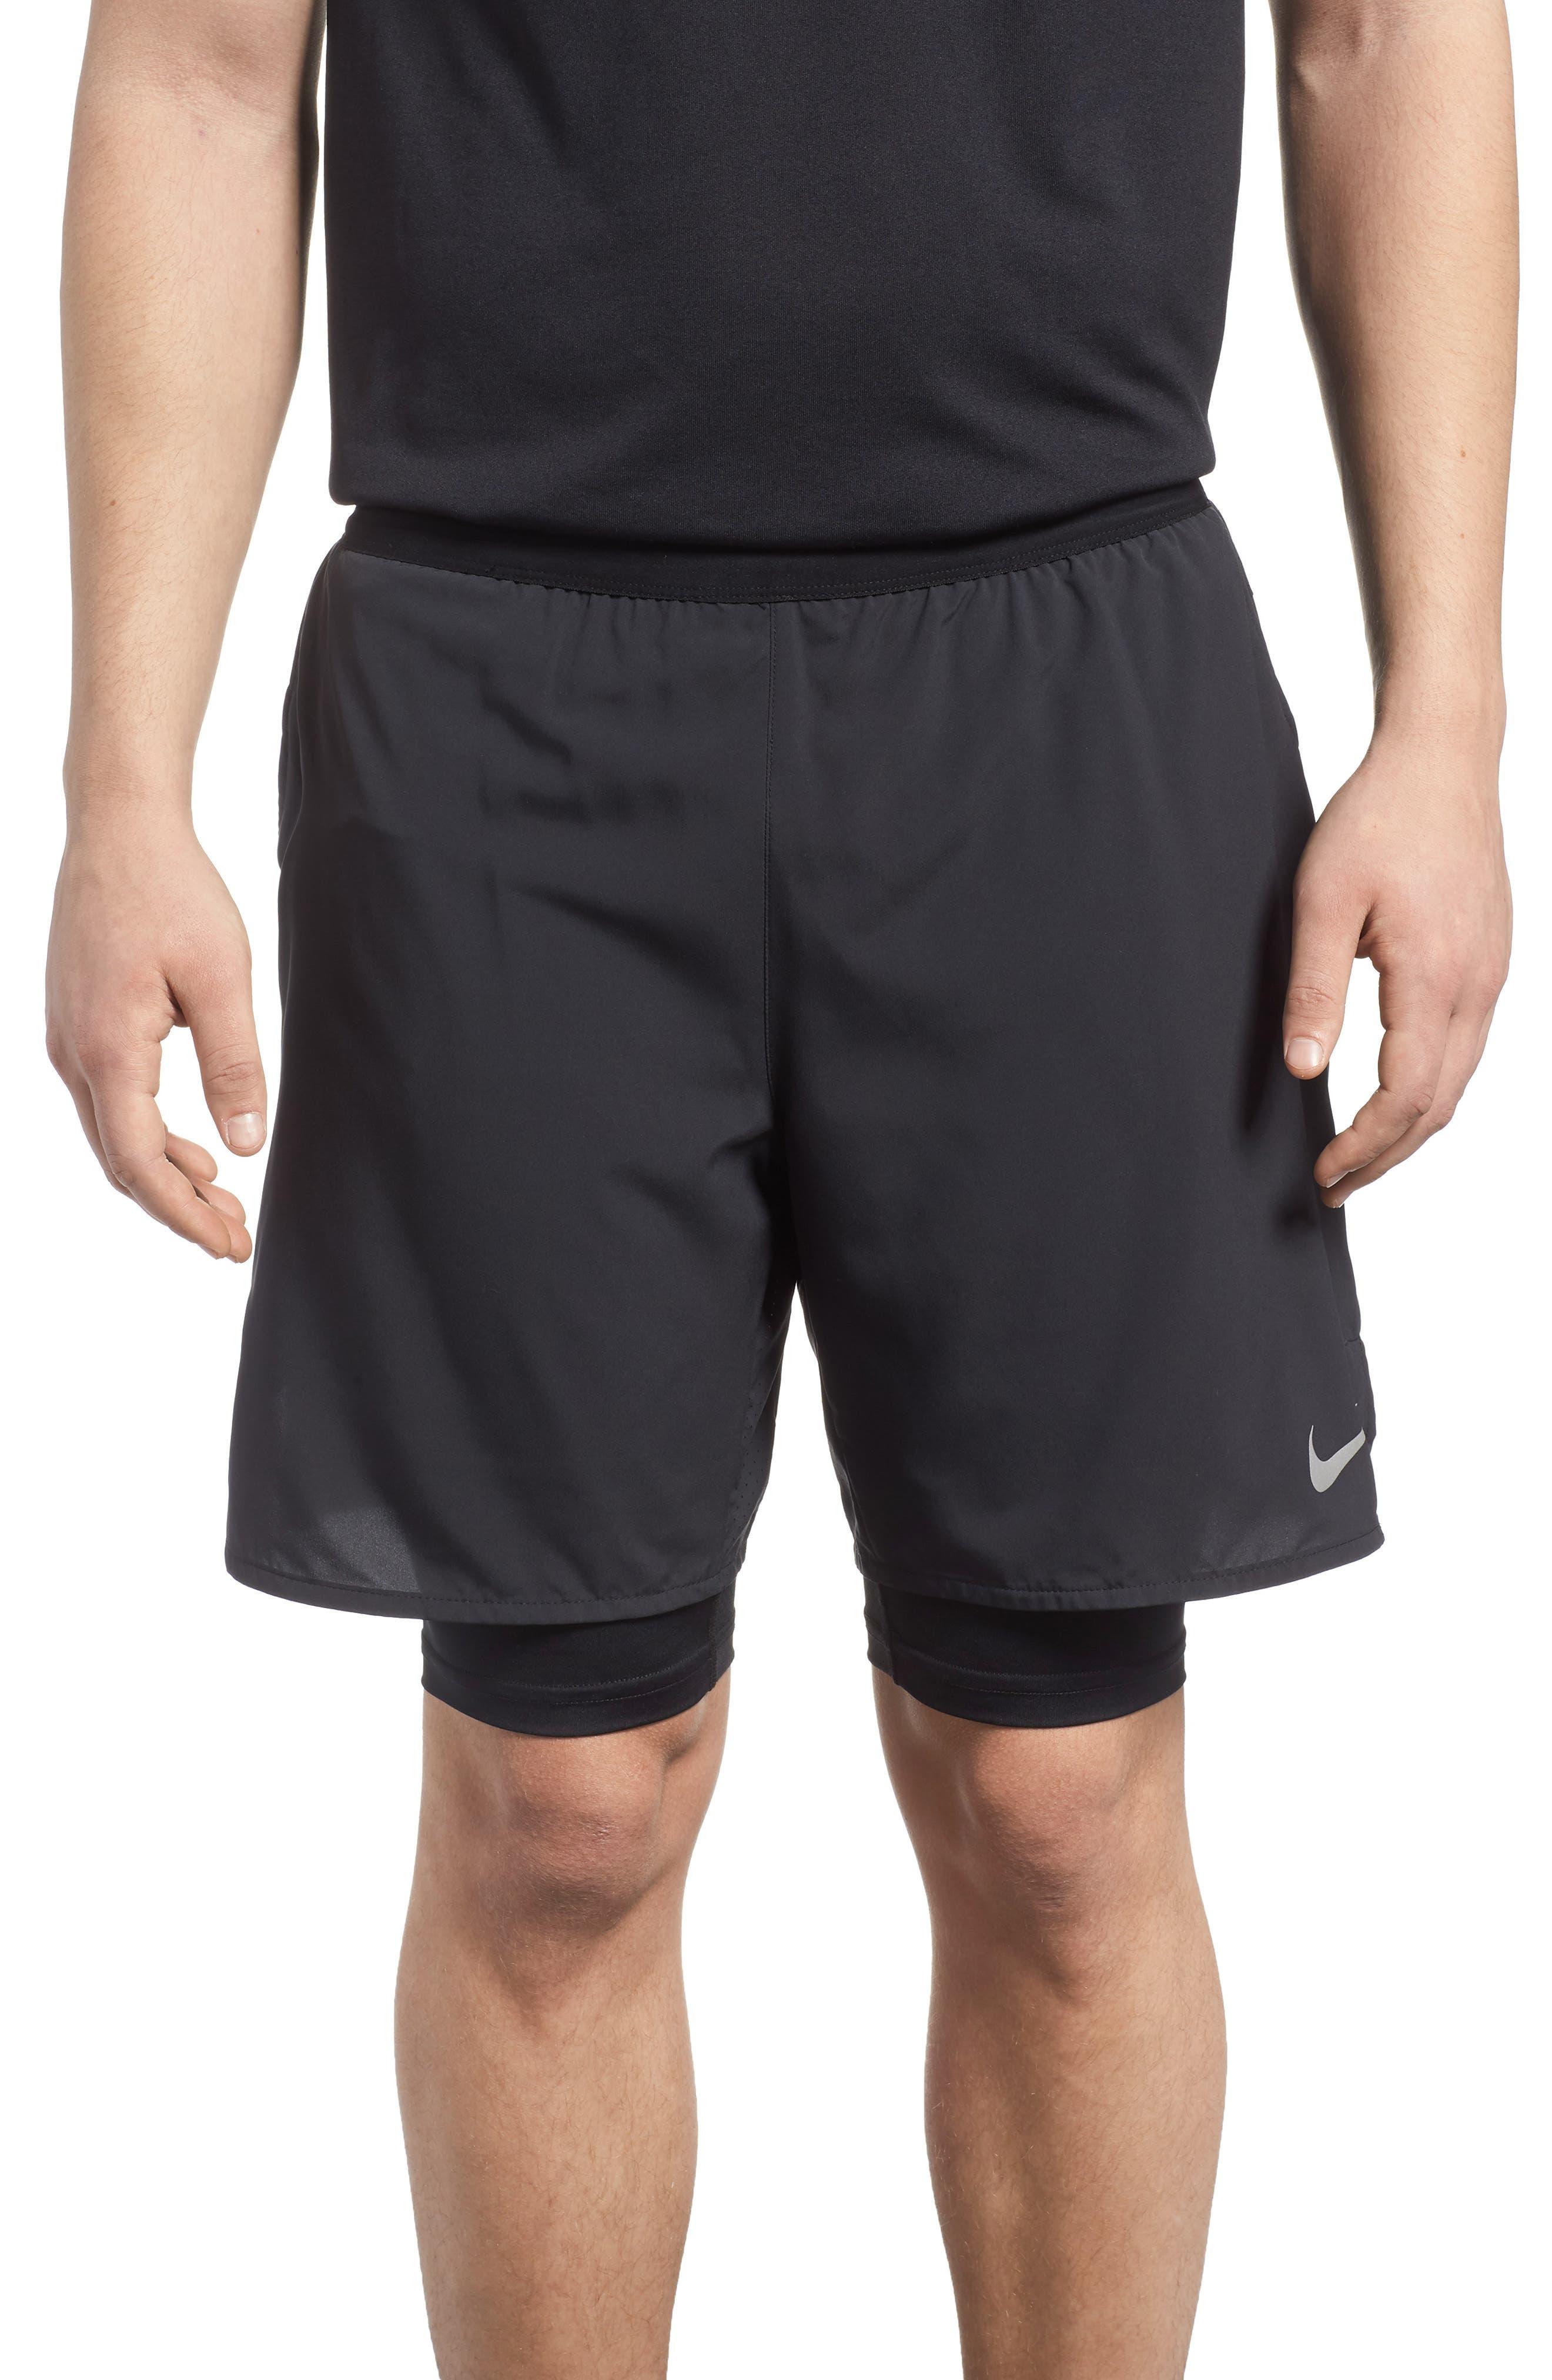 Flex Distance Running Shorts,                             Main thumbnail 1, color,                             Black/ Black